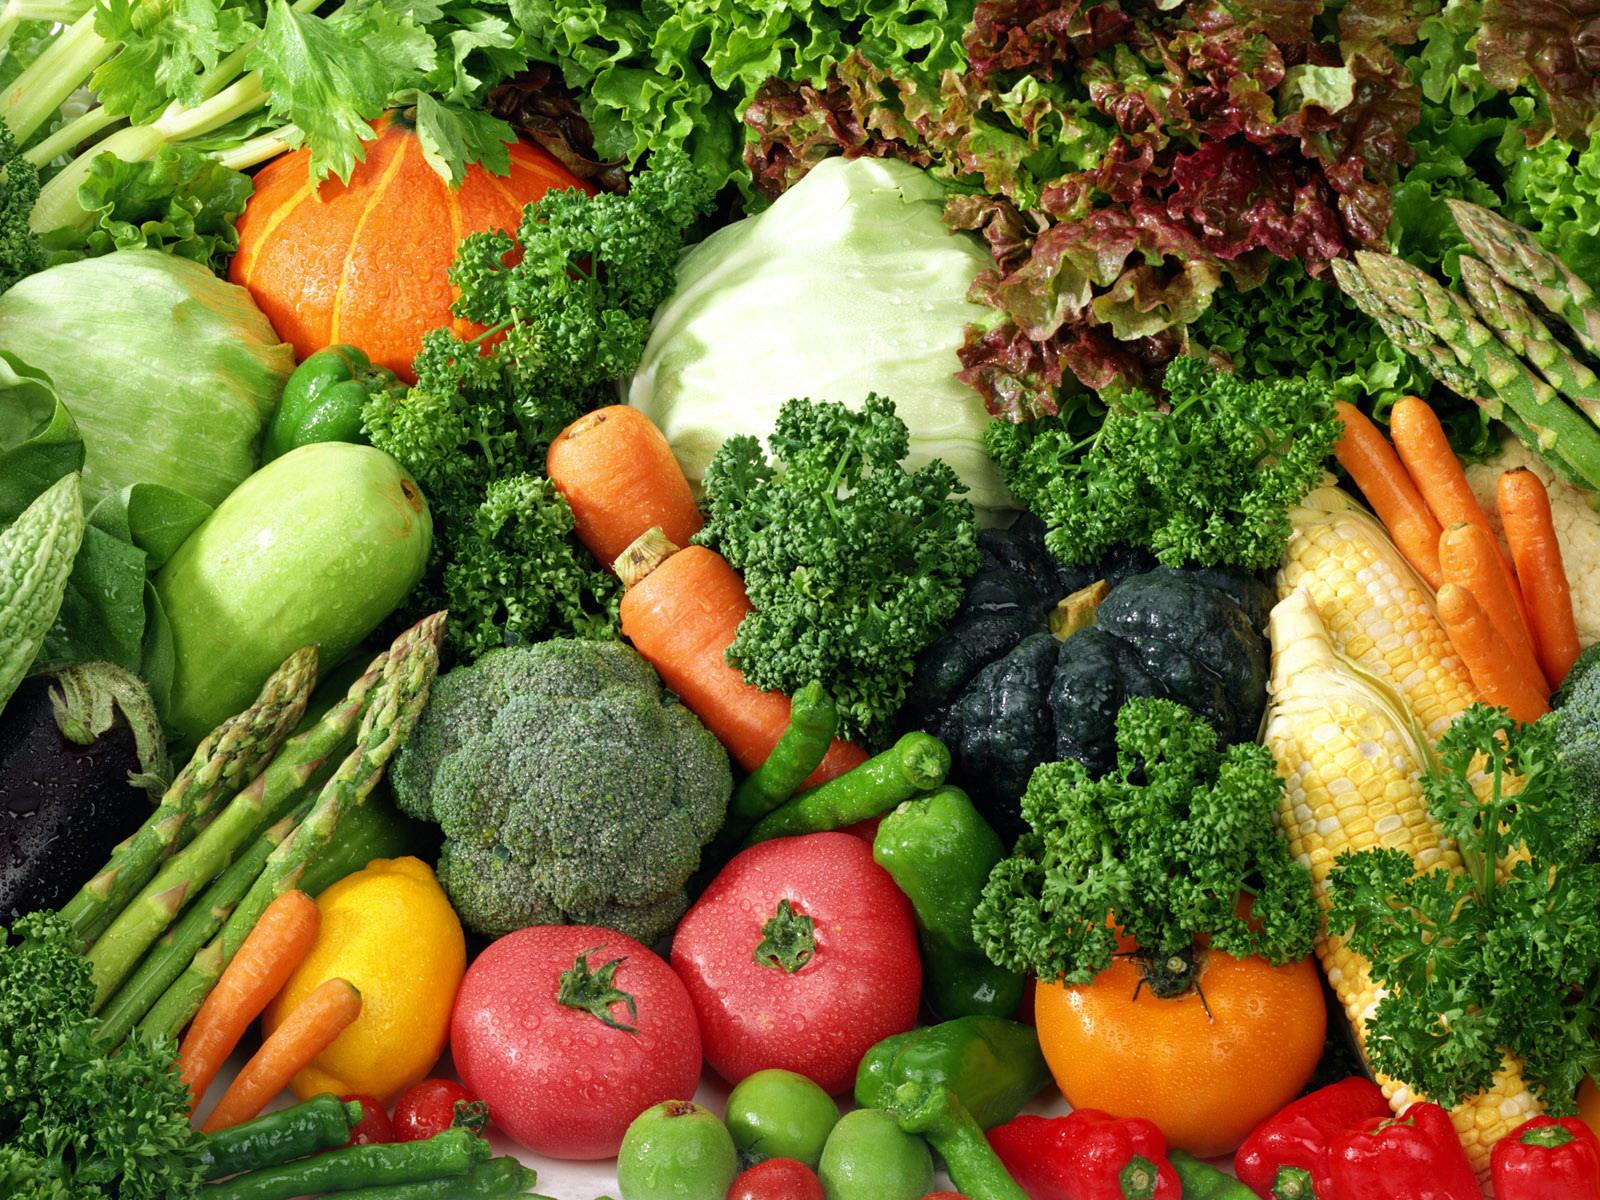 http://4.bp.blogspot.com/-nqF39w7yBl8/UBFjnfBXkyI/AAAAAAAAAhs/P-rRDnMi9Eg/s1600/1%2Bgreen_vegetables.jpg